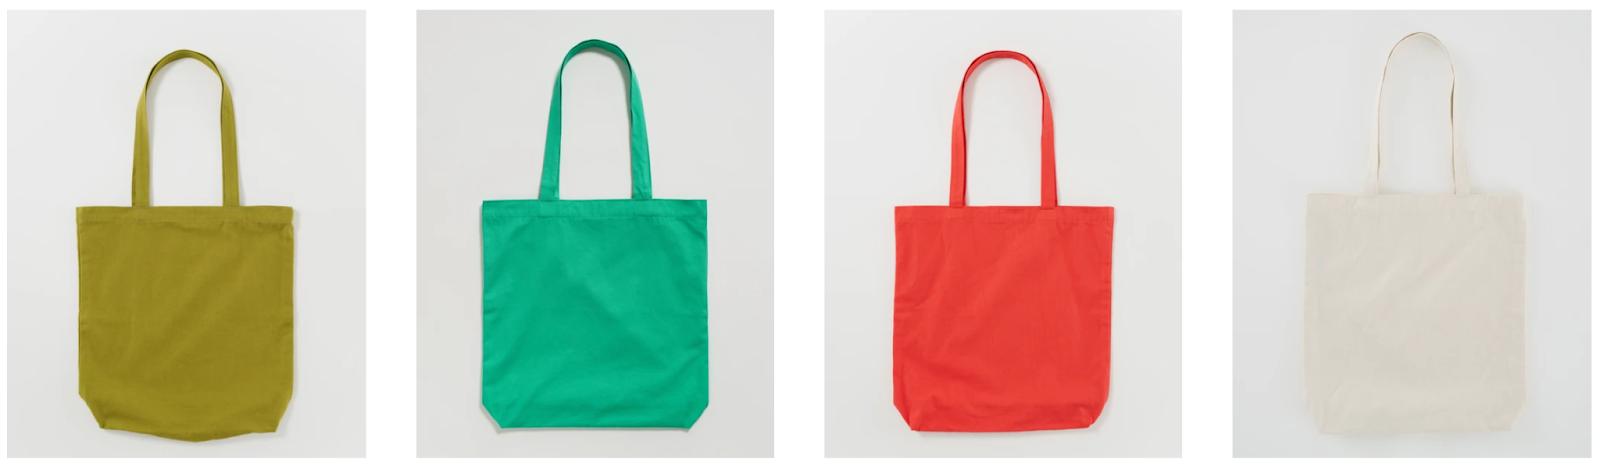 Baggu Multi-colored Canvas Tote Bags